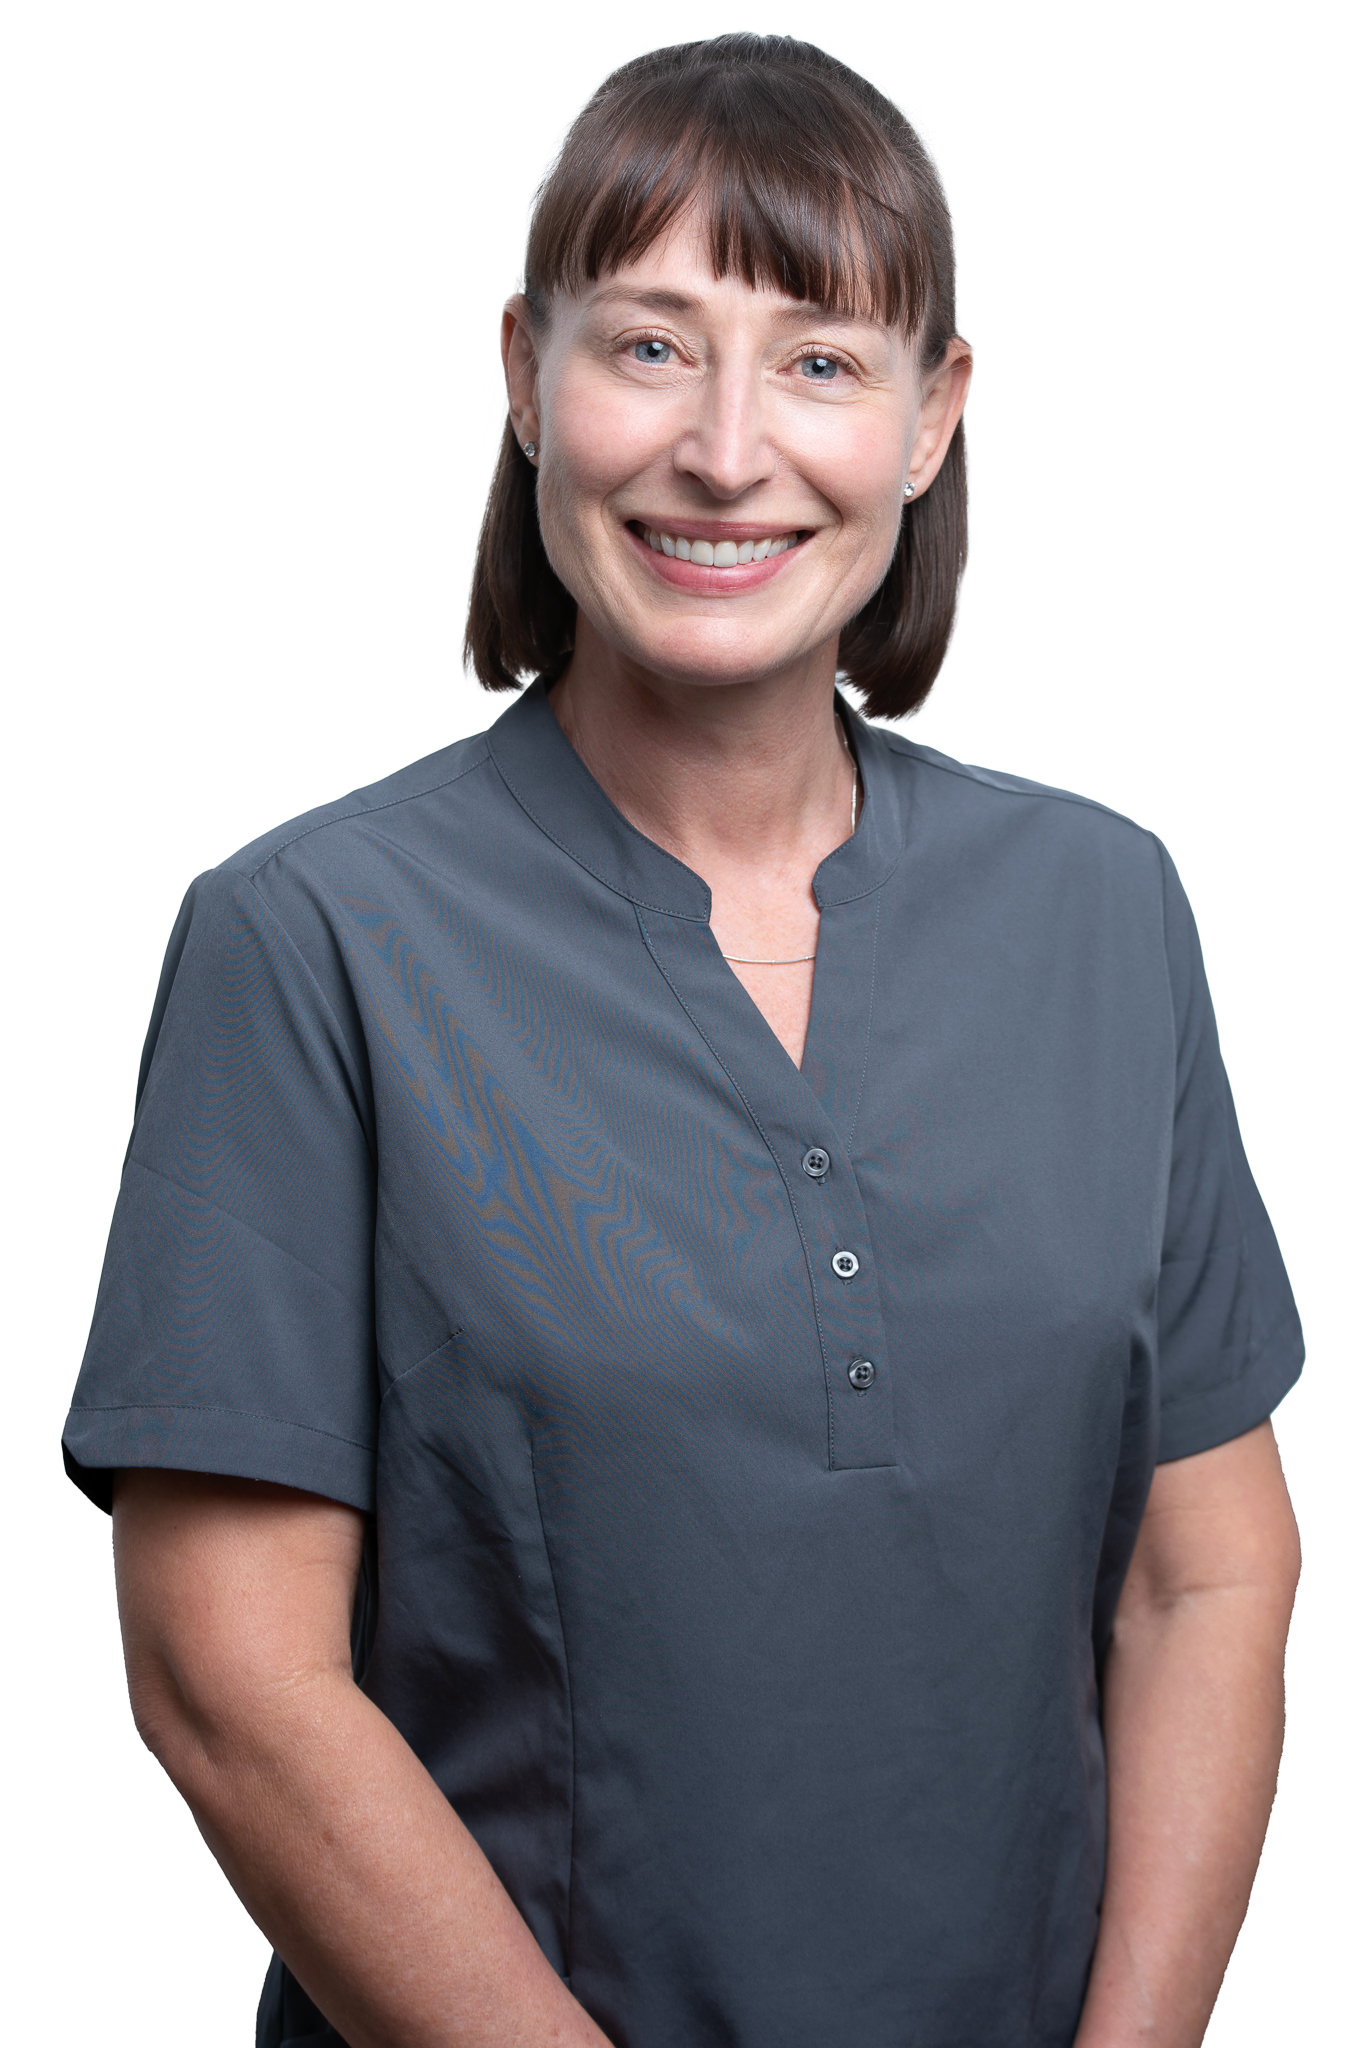 Dr. Alison Wissman